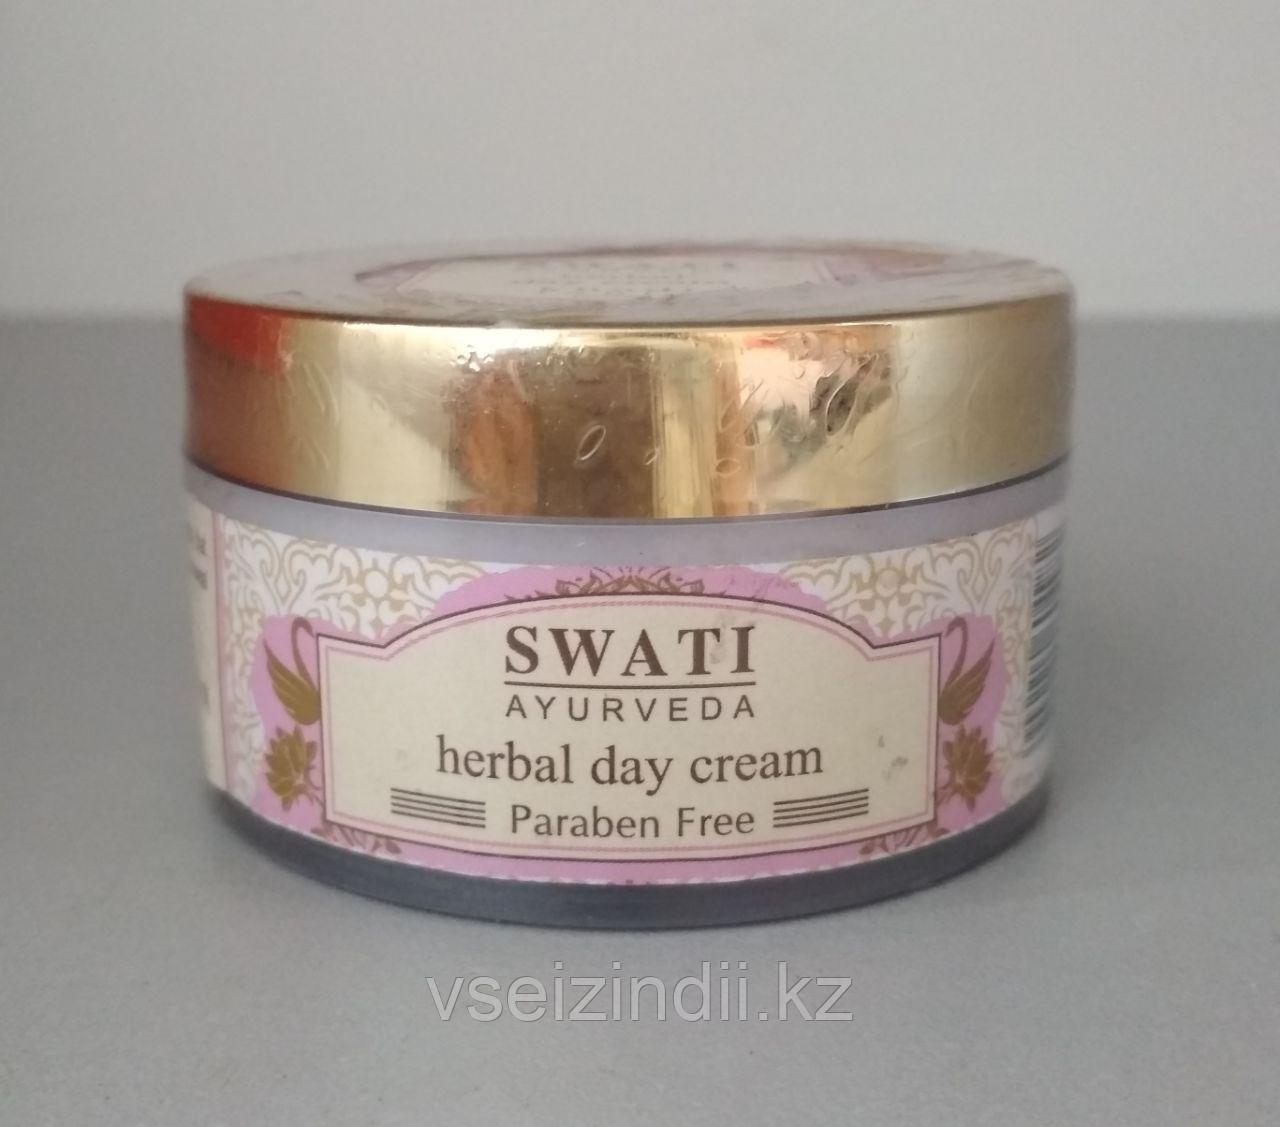 Крем для лица дневной, Свати / Swati, 50 гр